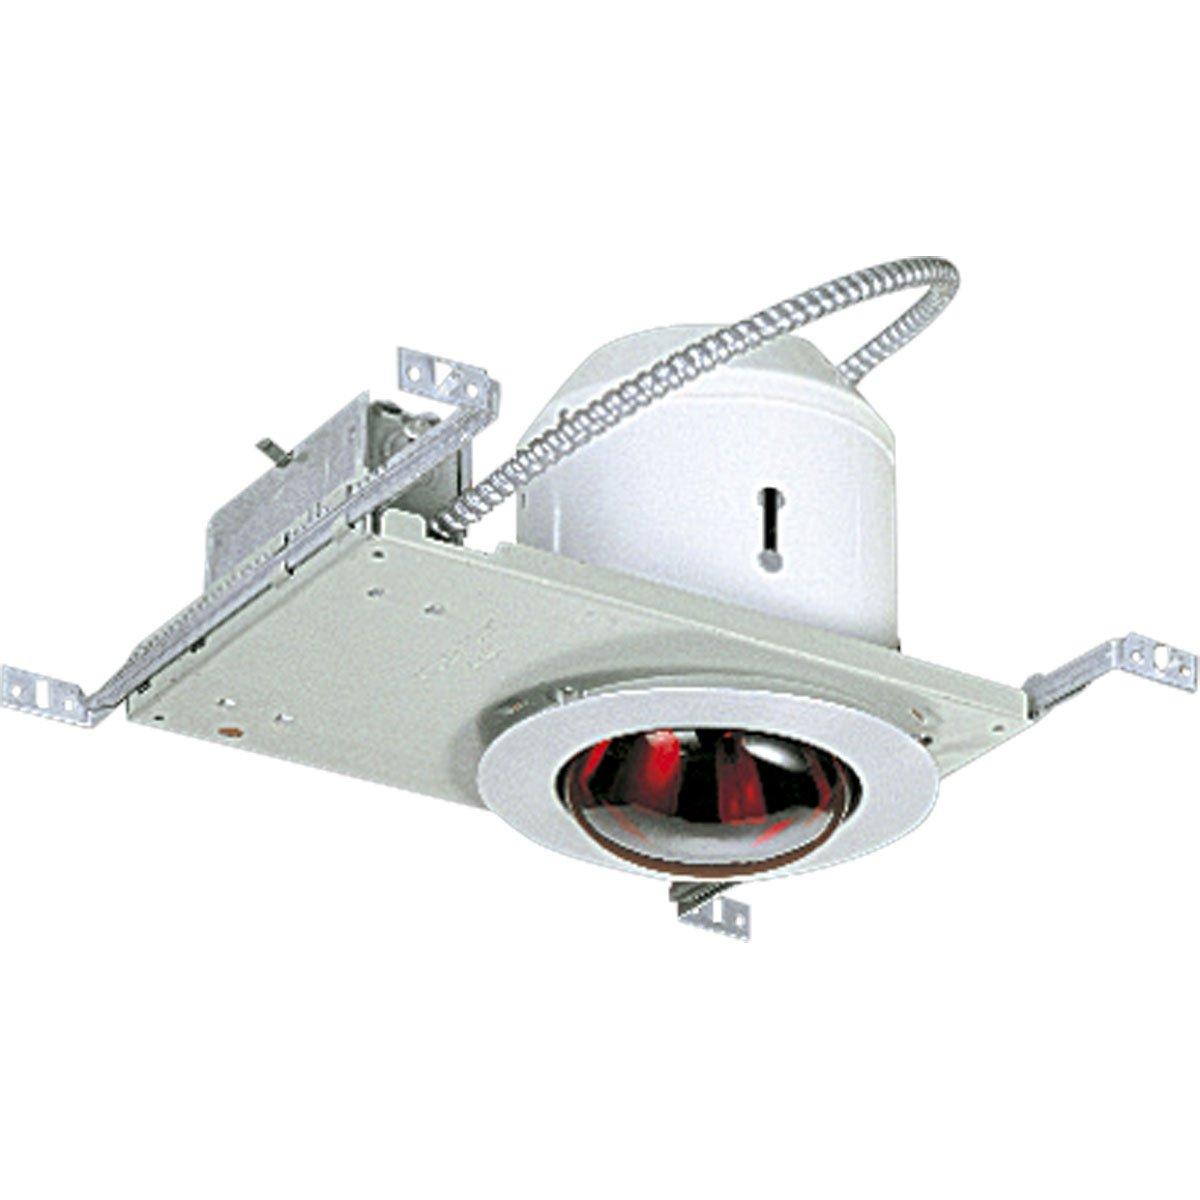 Infrared Bathroom Light Progress Lighting P6952 16tg Heater Light Complete With Housing